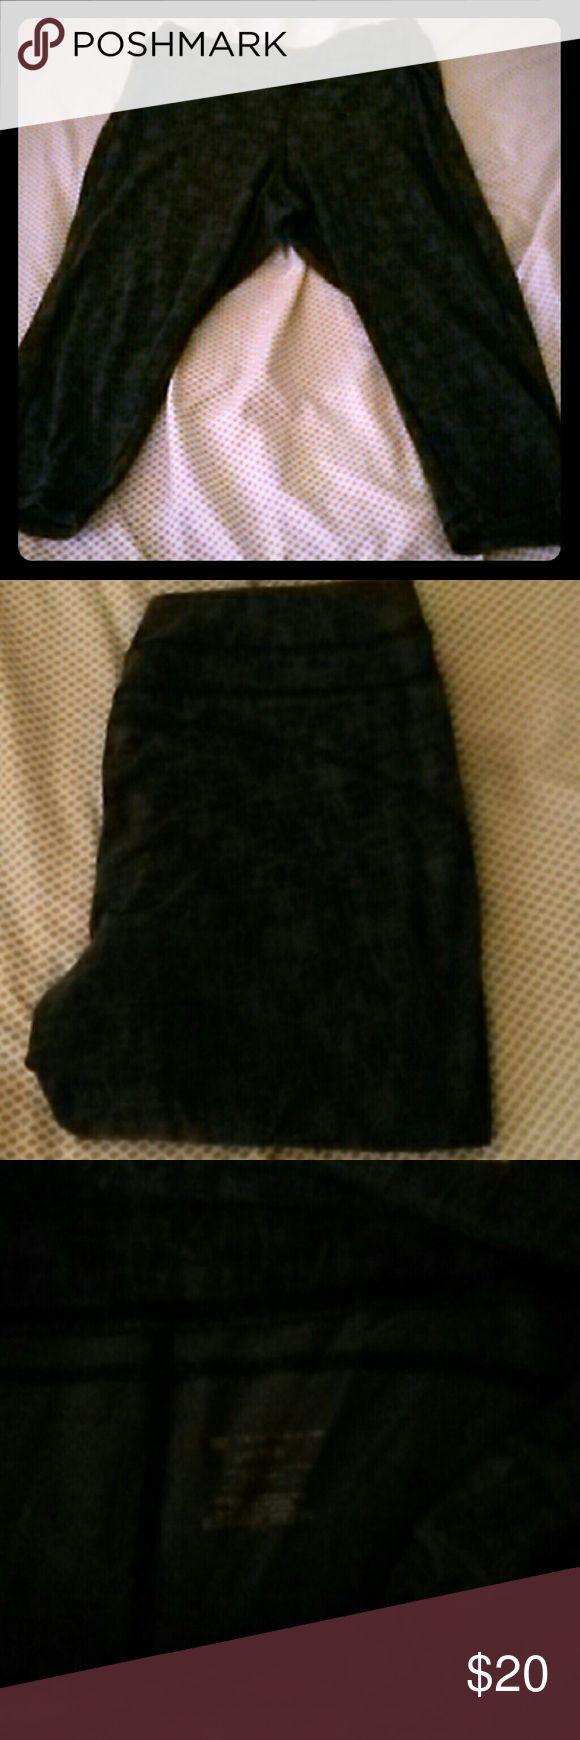 Athletic capris Designed black and gray athletic capris tek gear Pants Capris